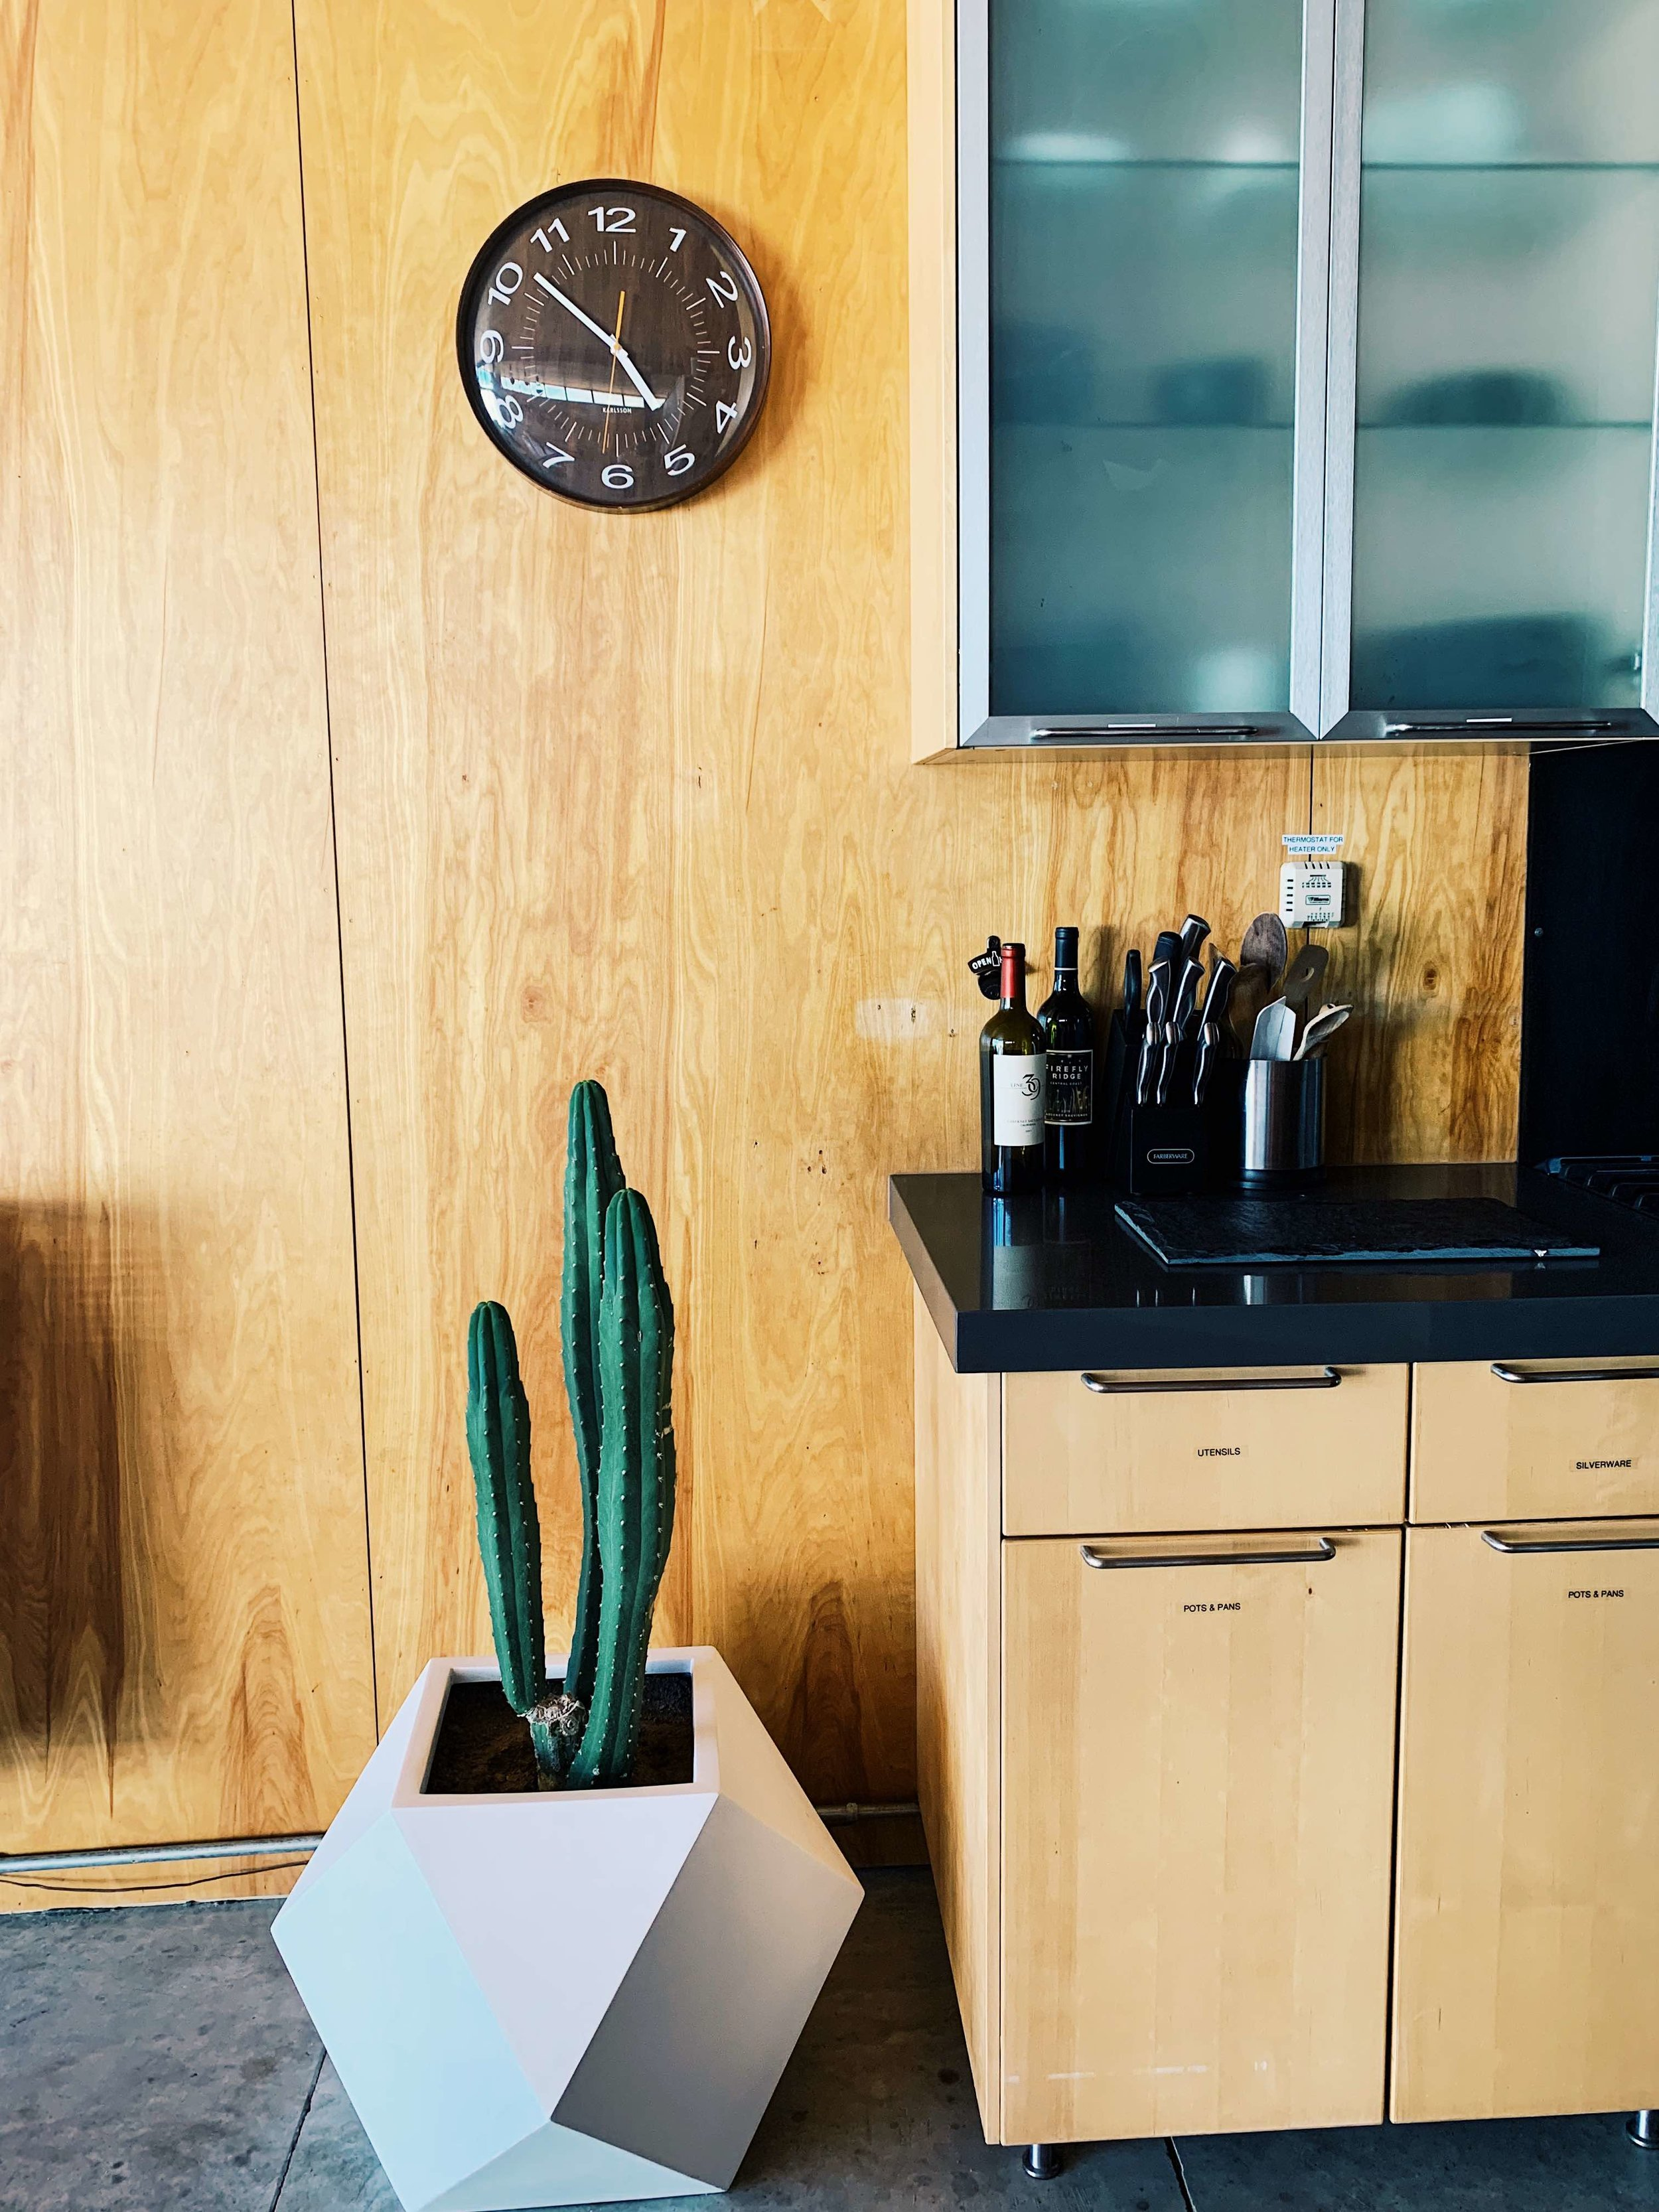 airbnb-art loft-joshua tree - 31.jpg